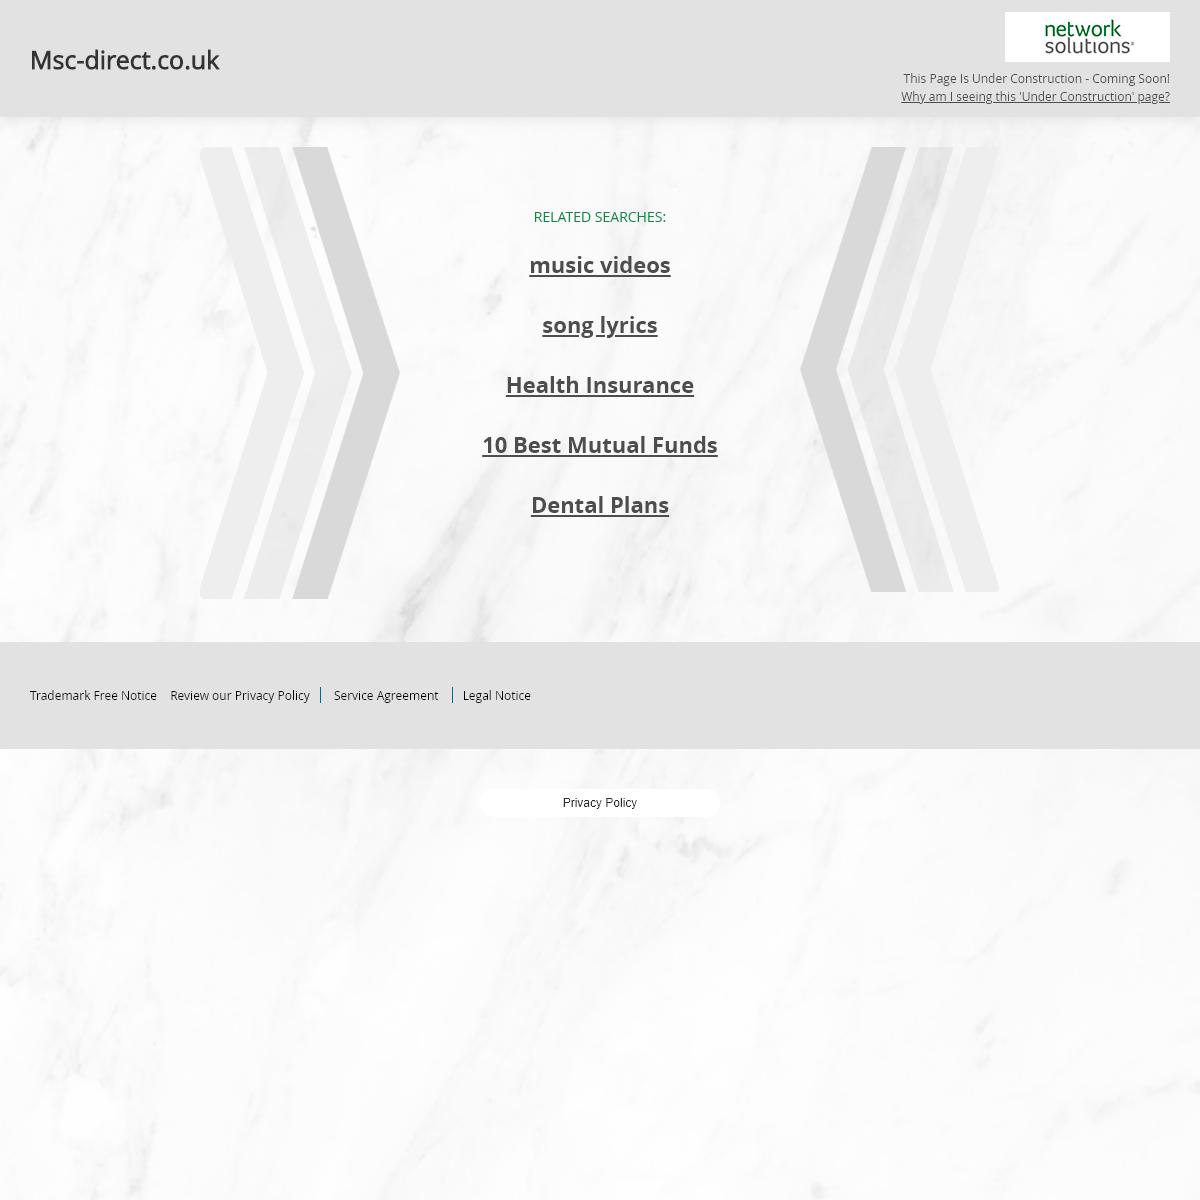 Msc-direct.co.uk